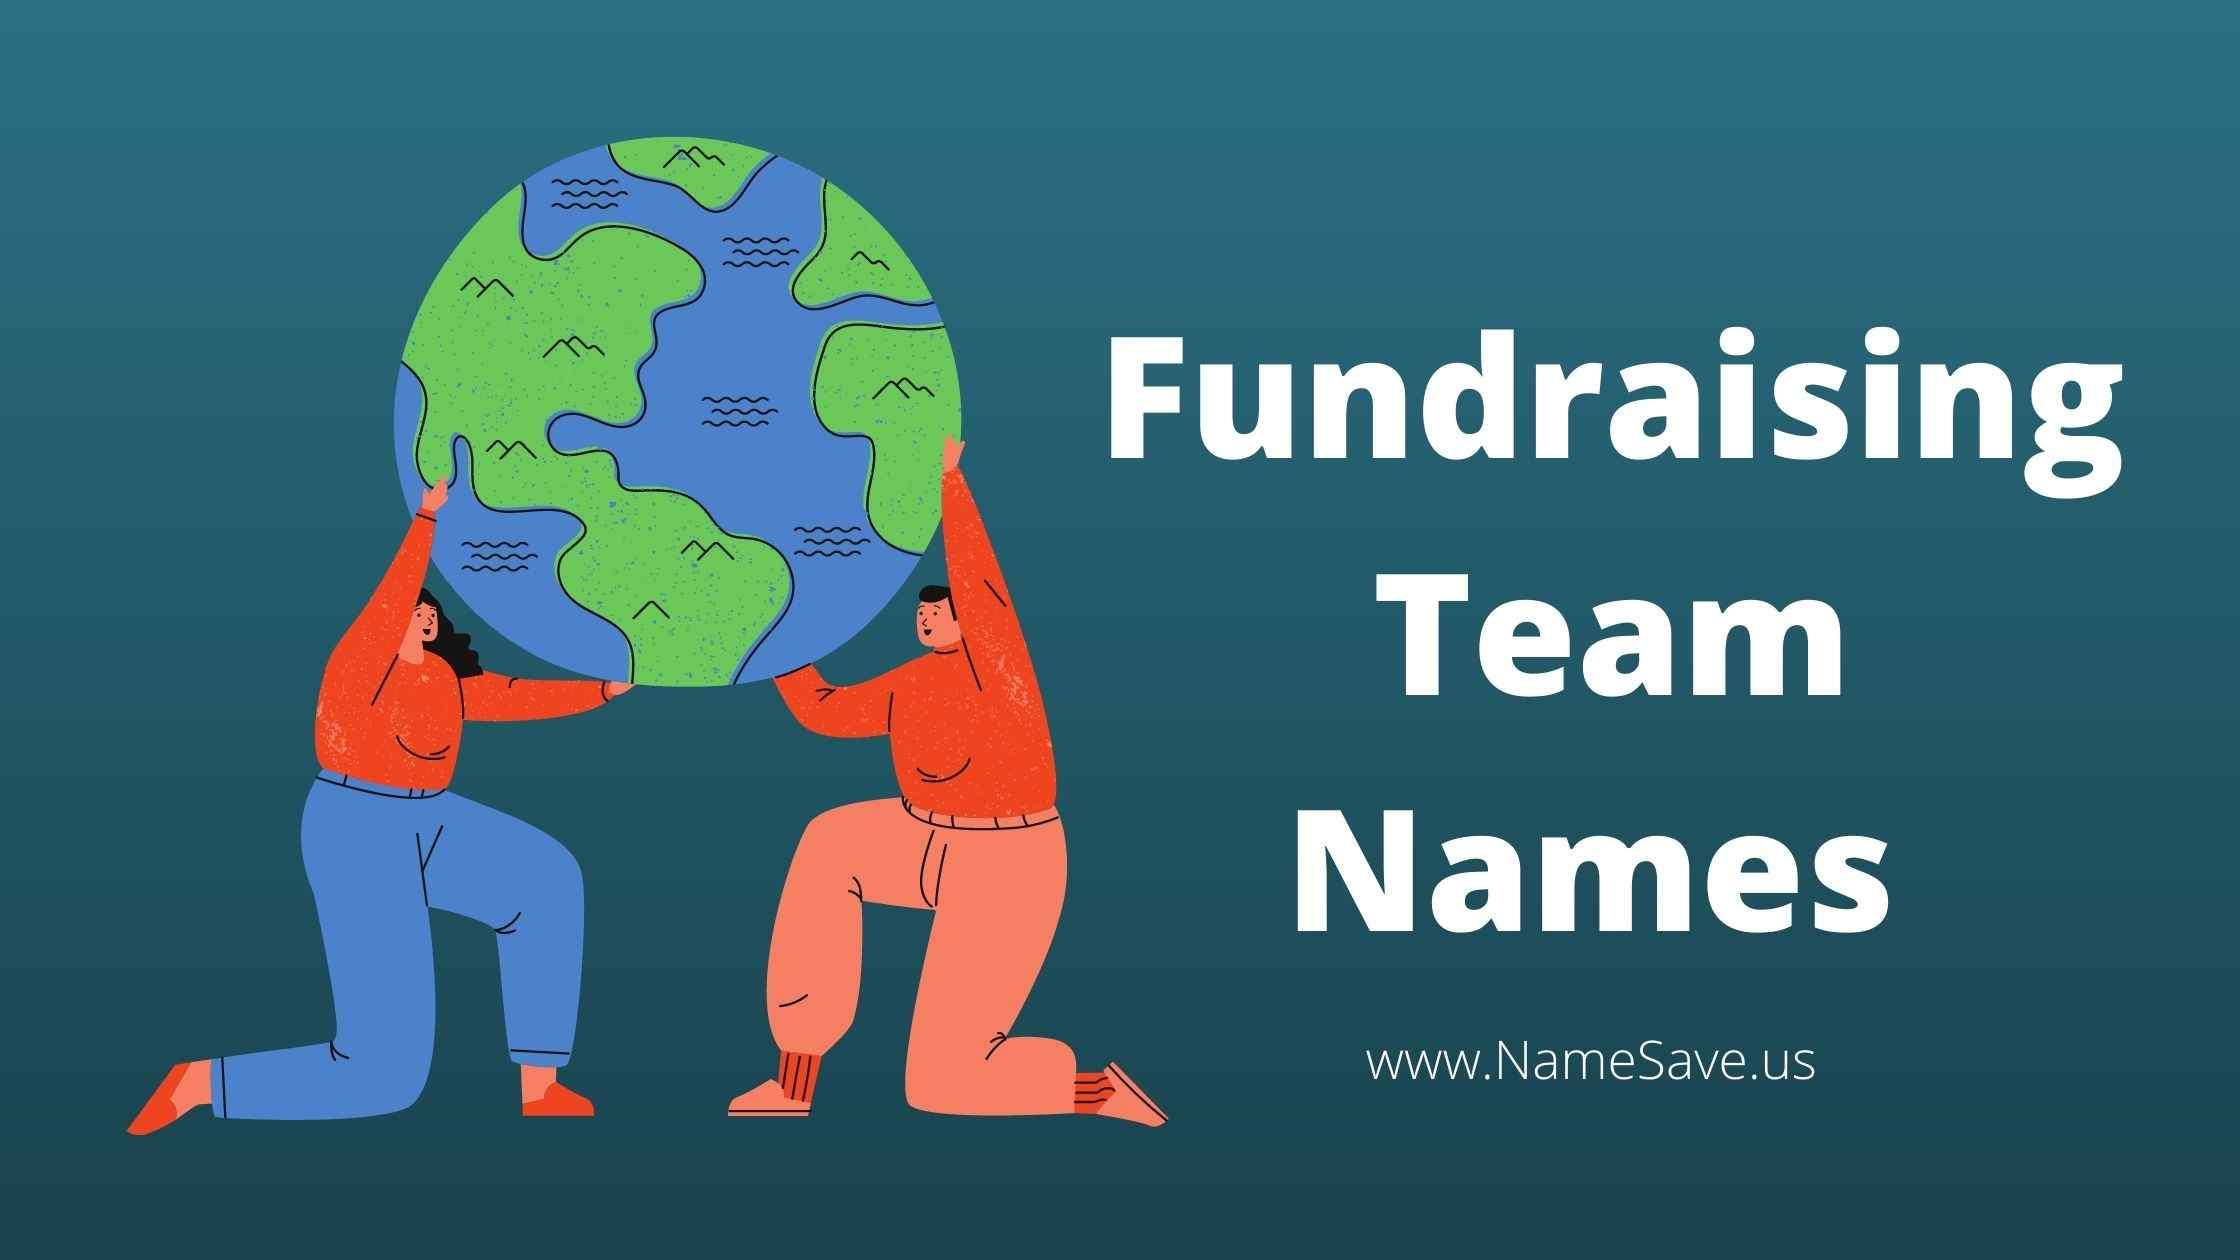 Fundraising Team Names